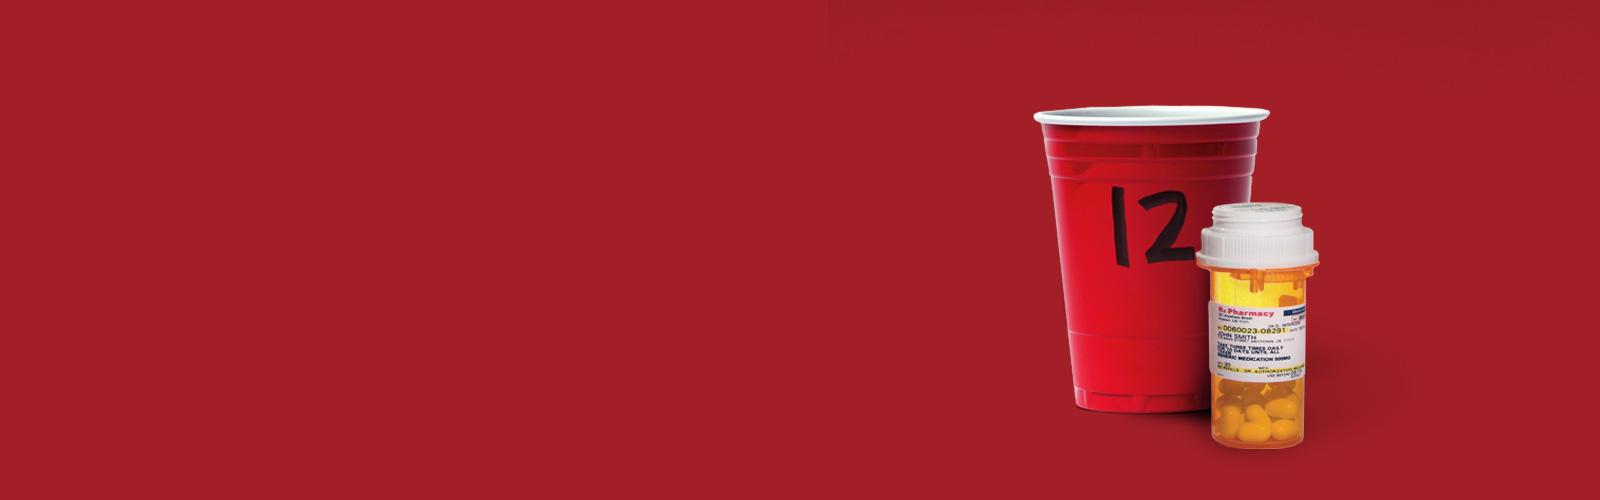 header red cups pills - Talking Tips